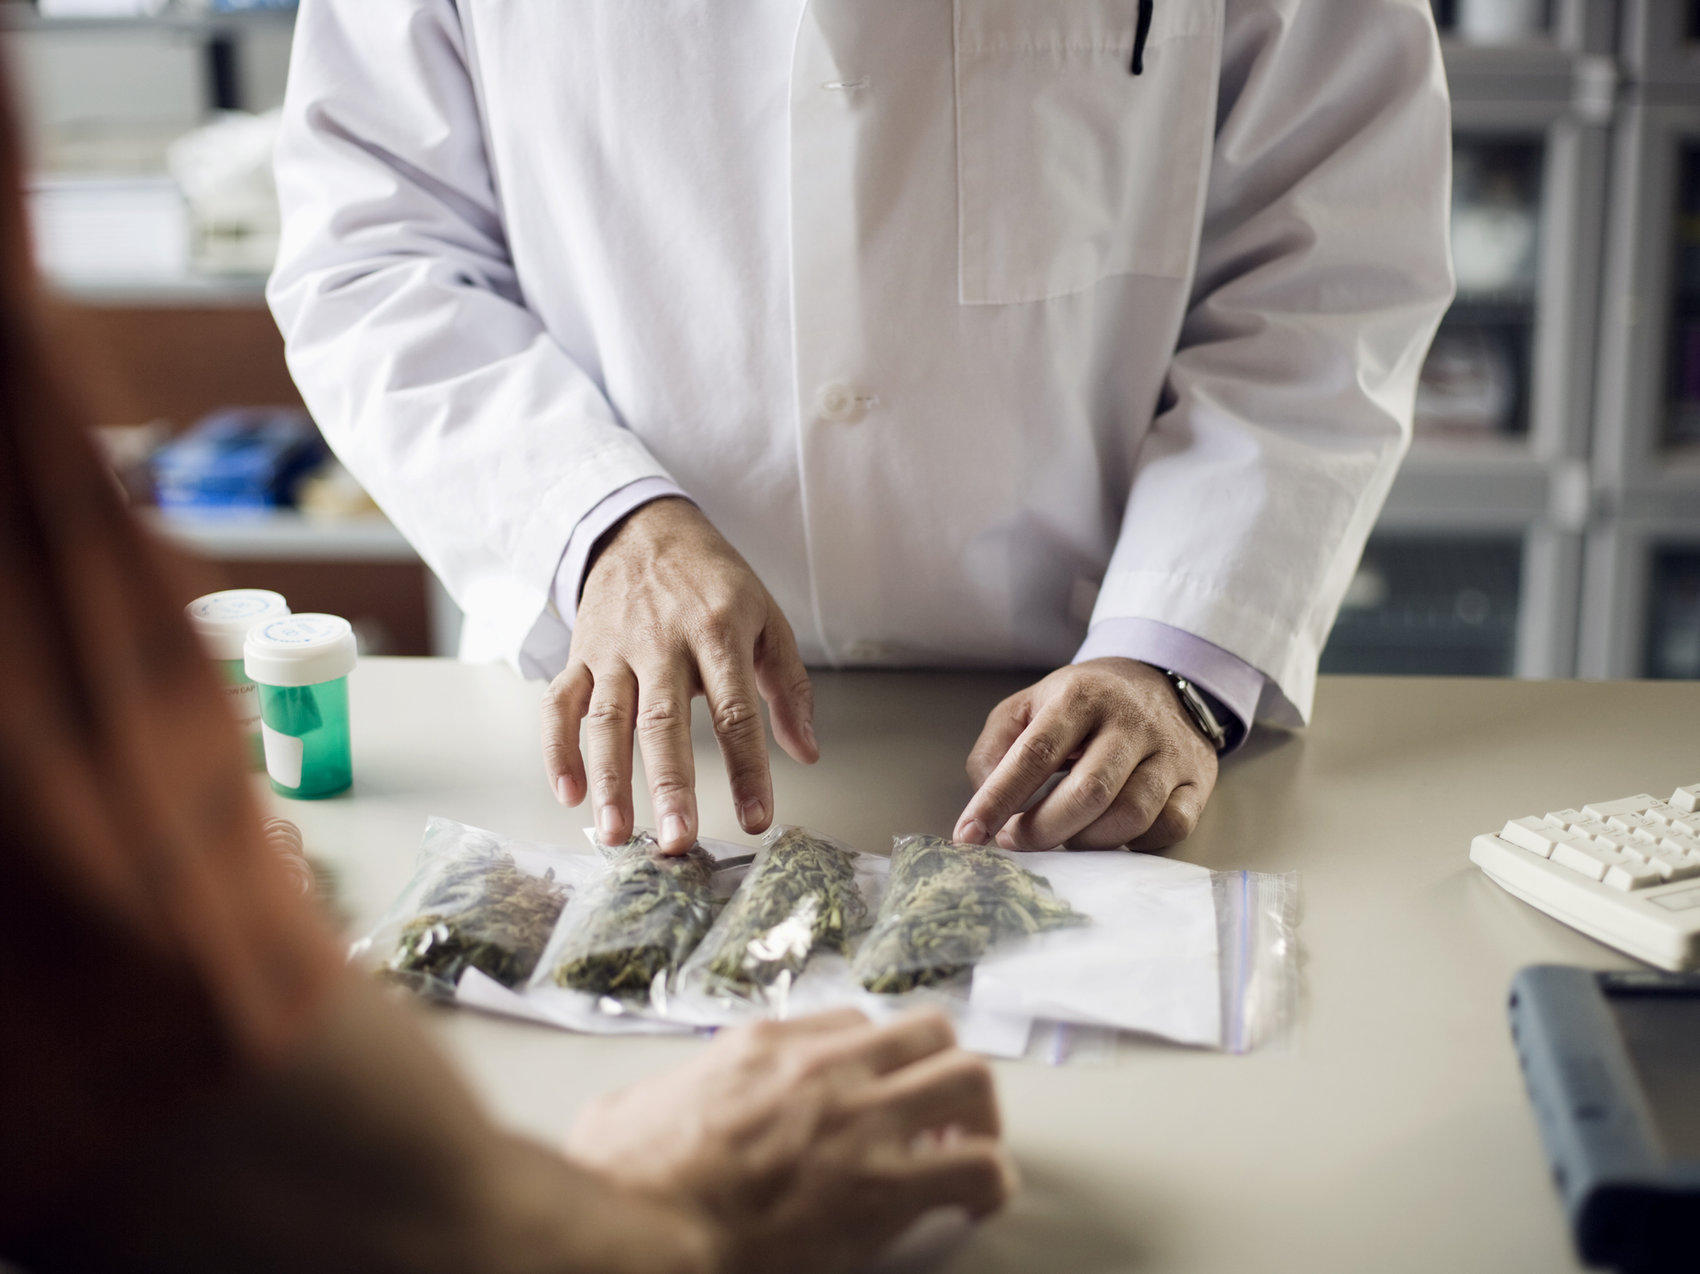 Many cancer patients seek treatment with medical marijuana.